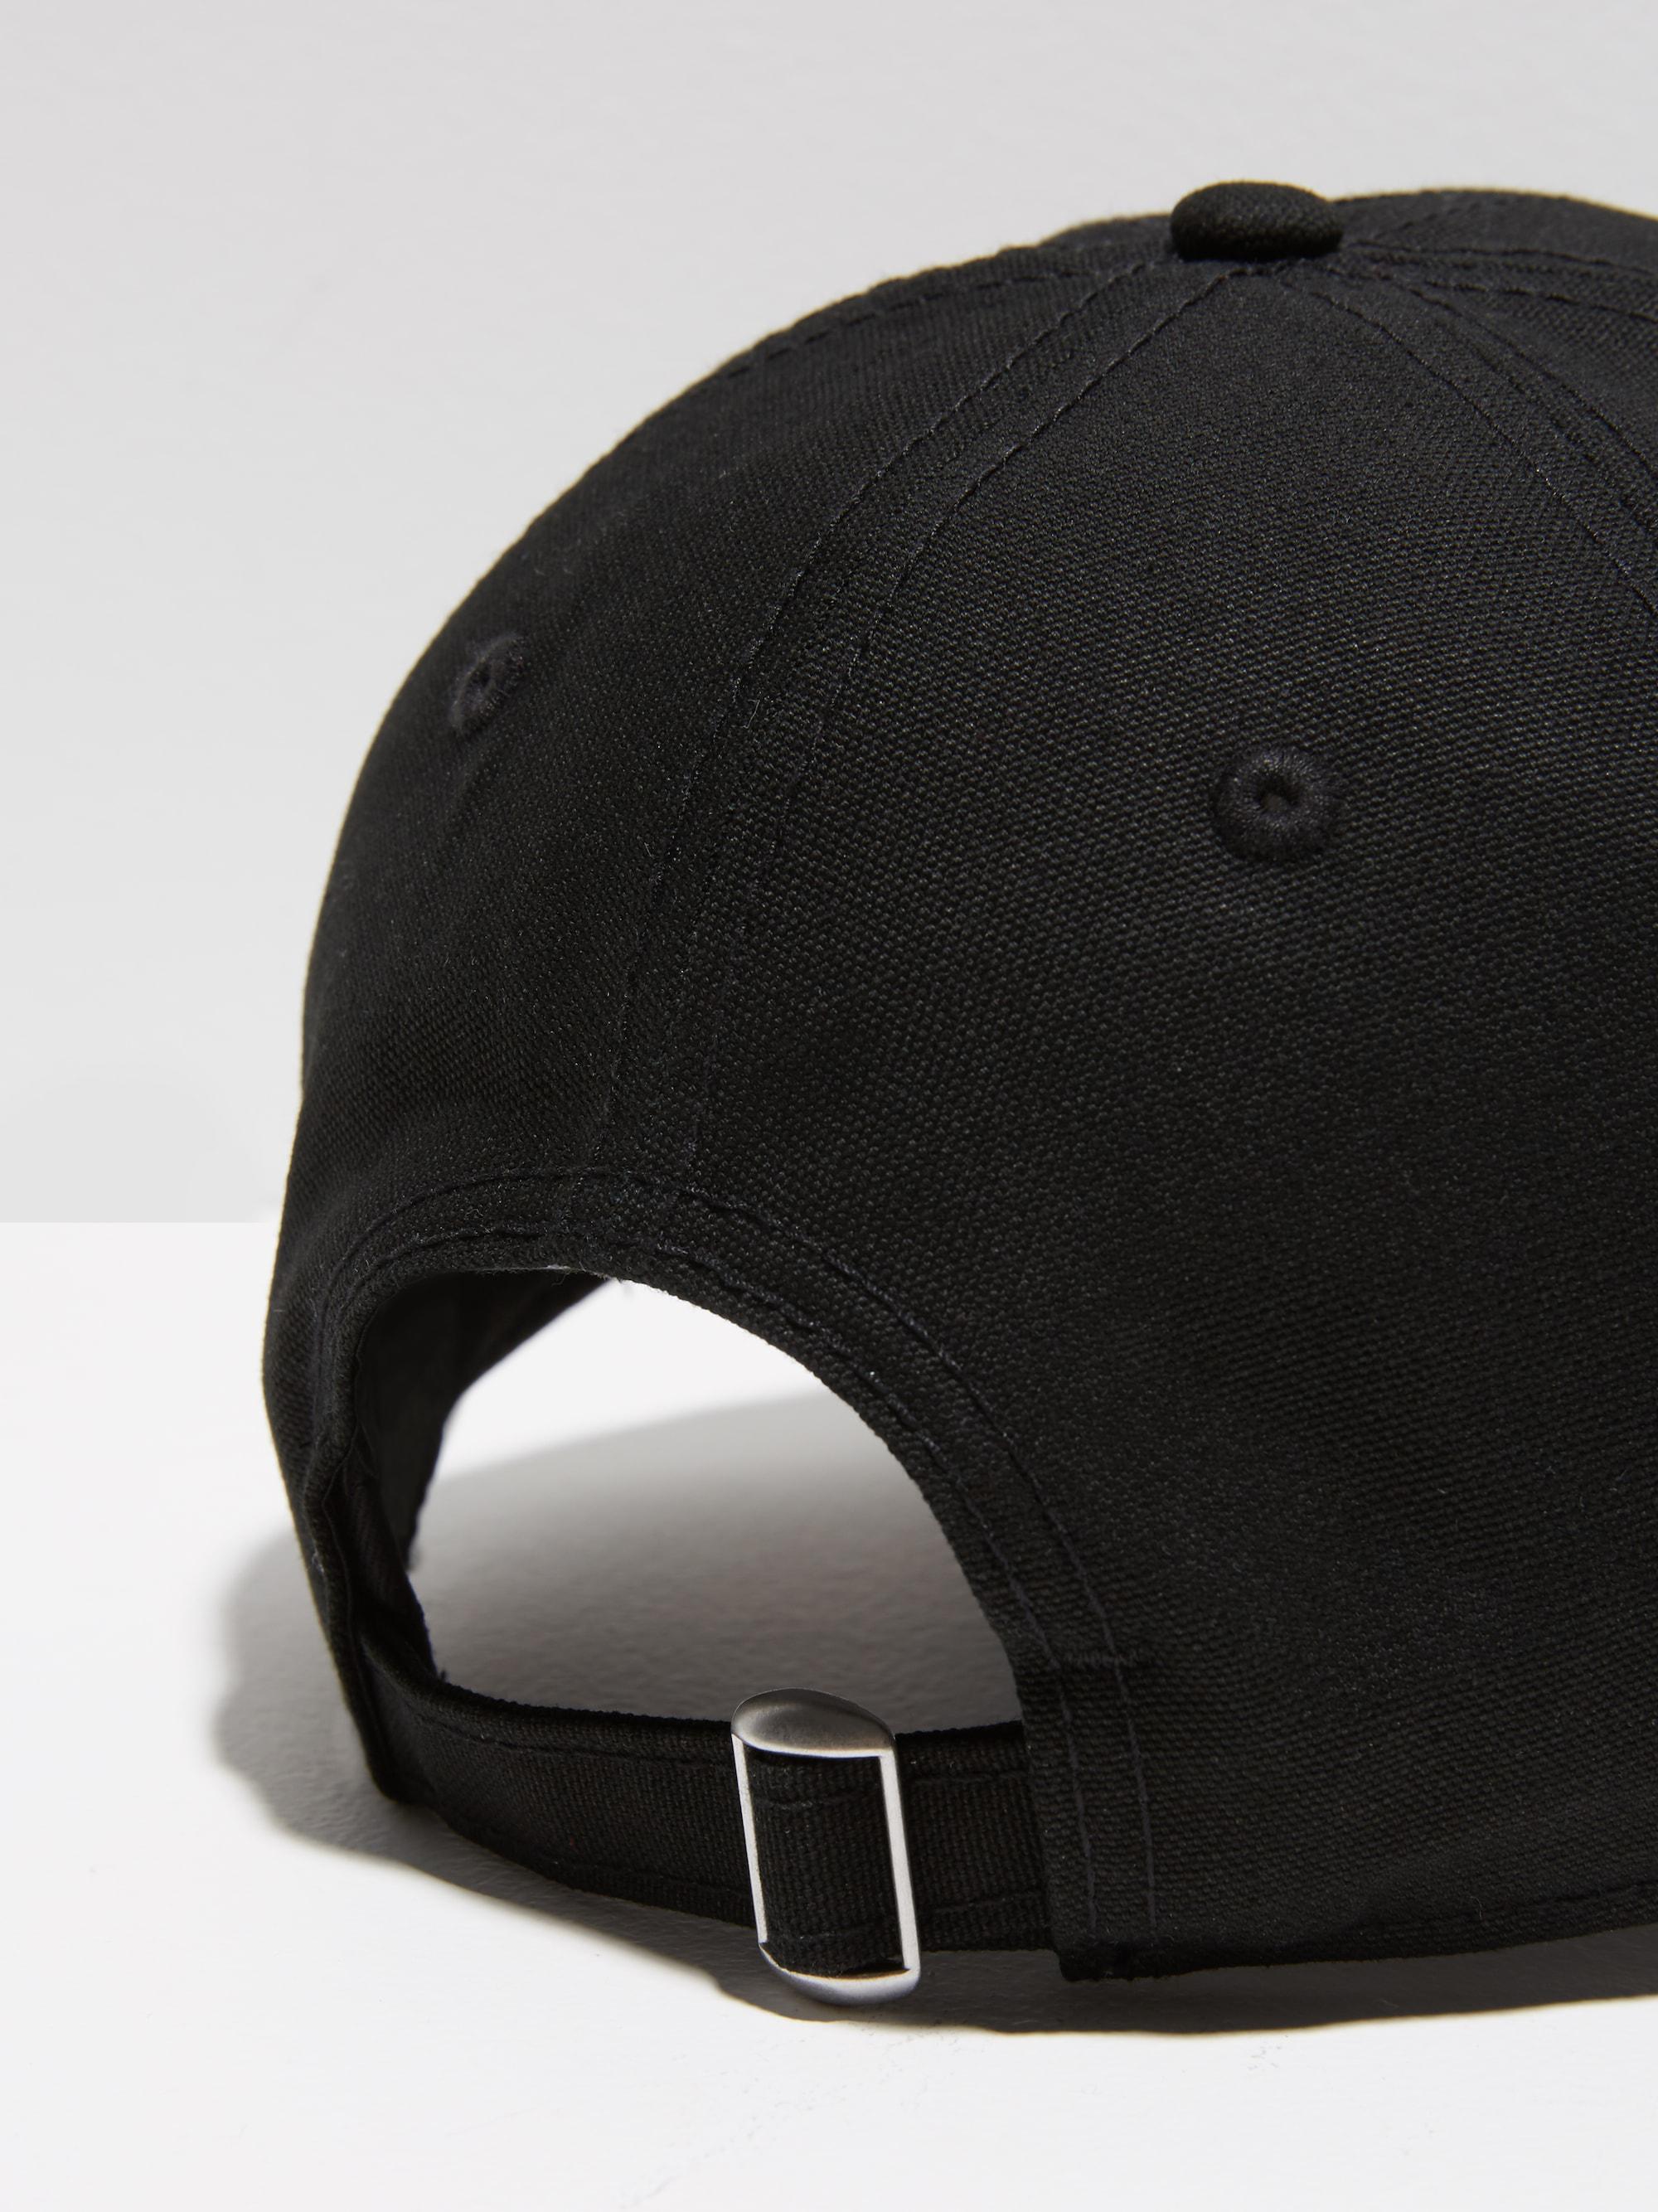 release date 0618b 937b0 Frank And Oak Toronto Raptors Special Edition Cap In Black in Black ...